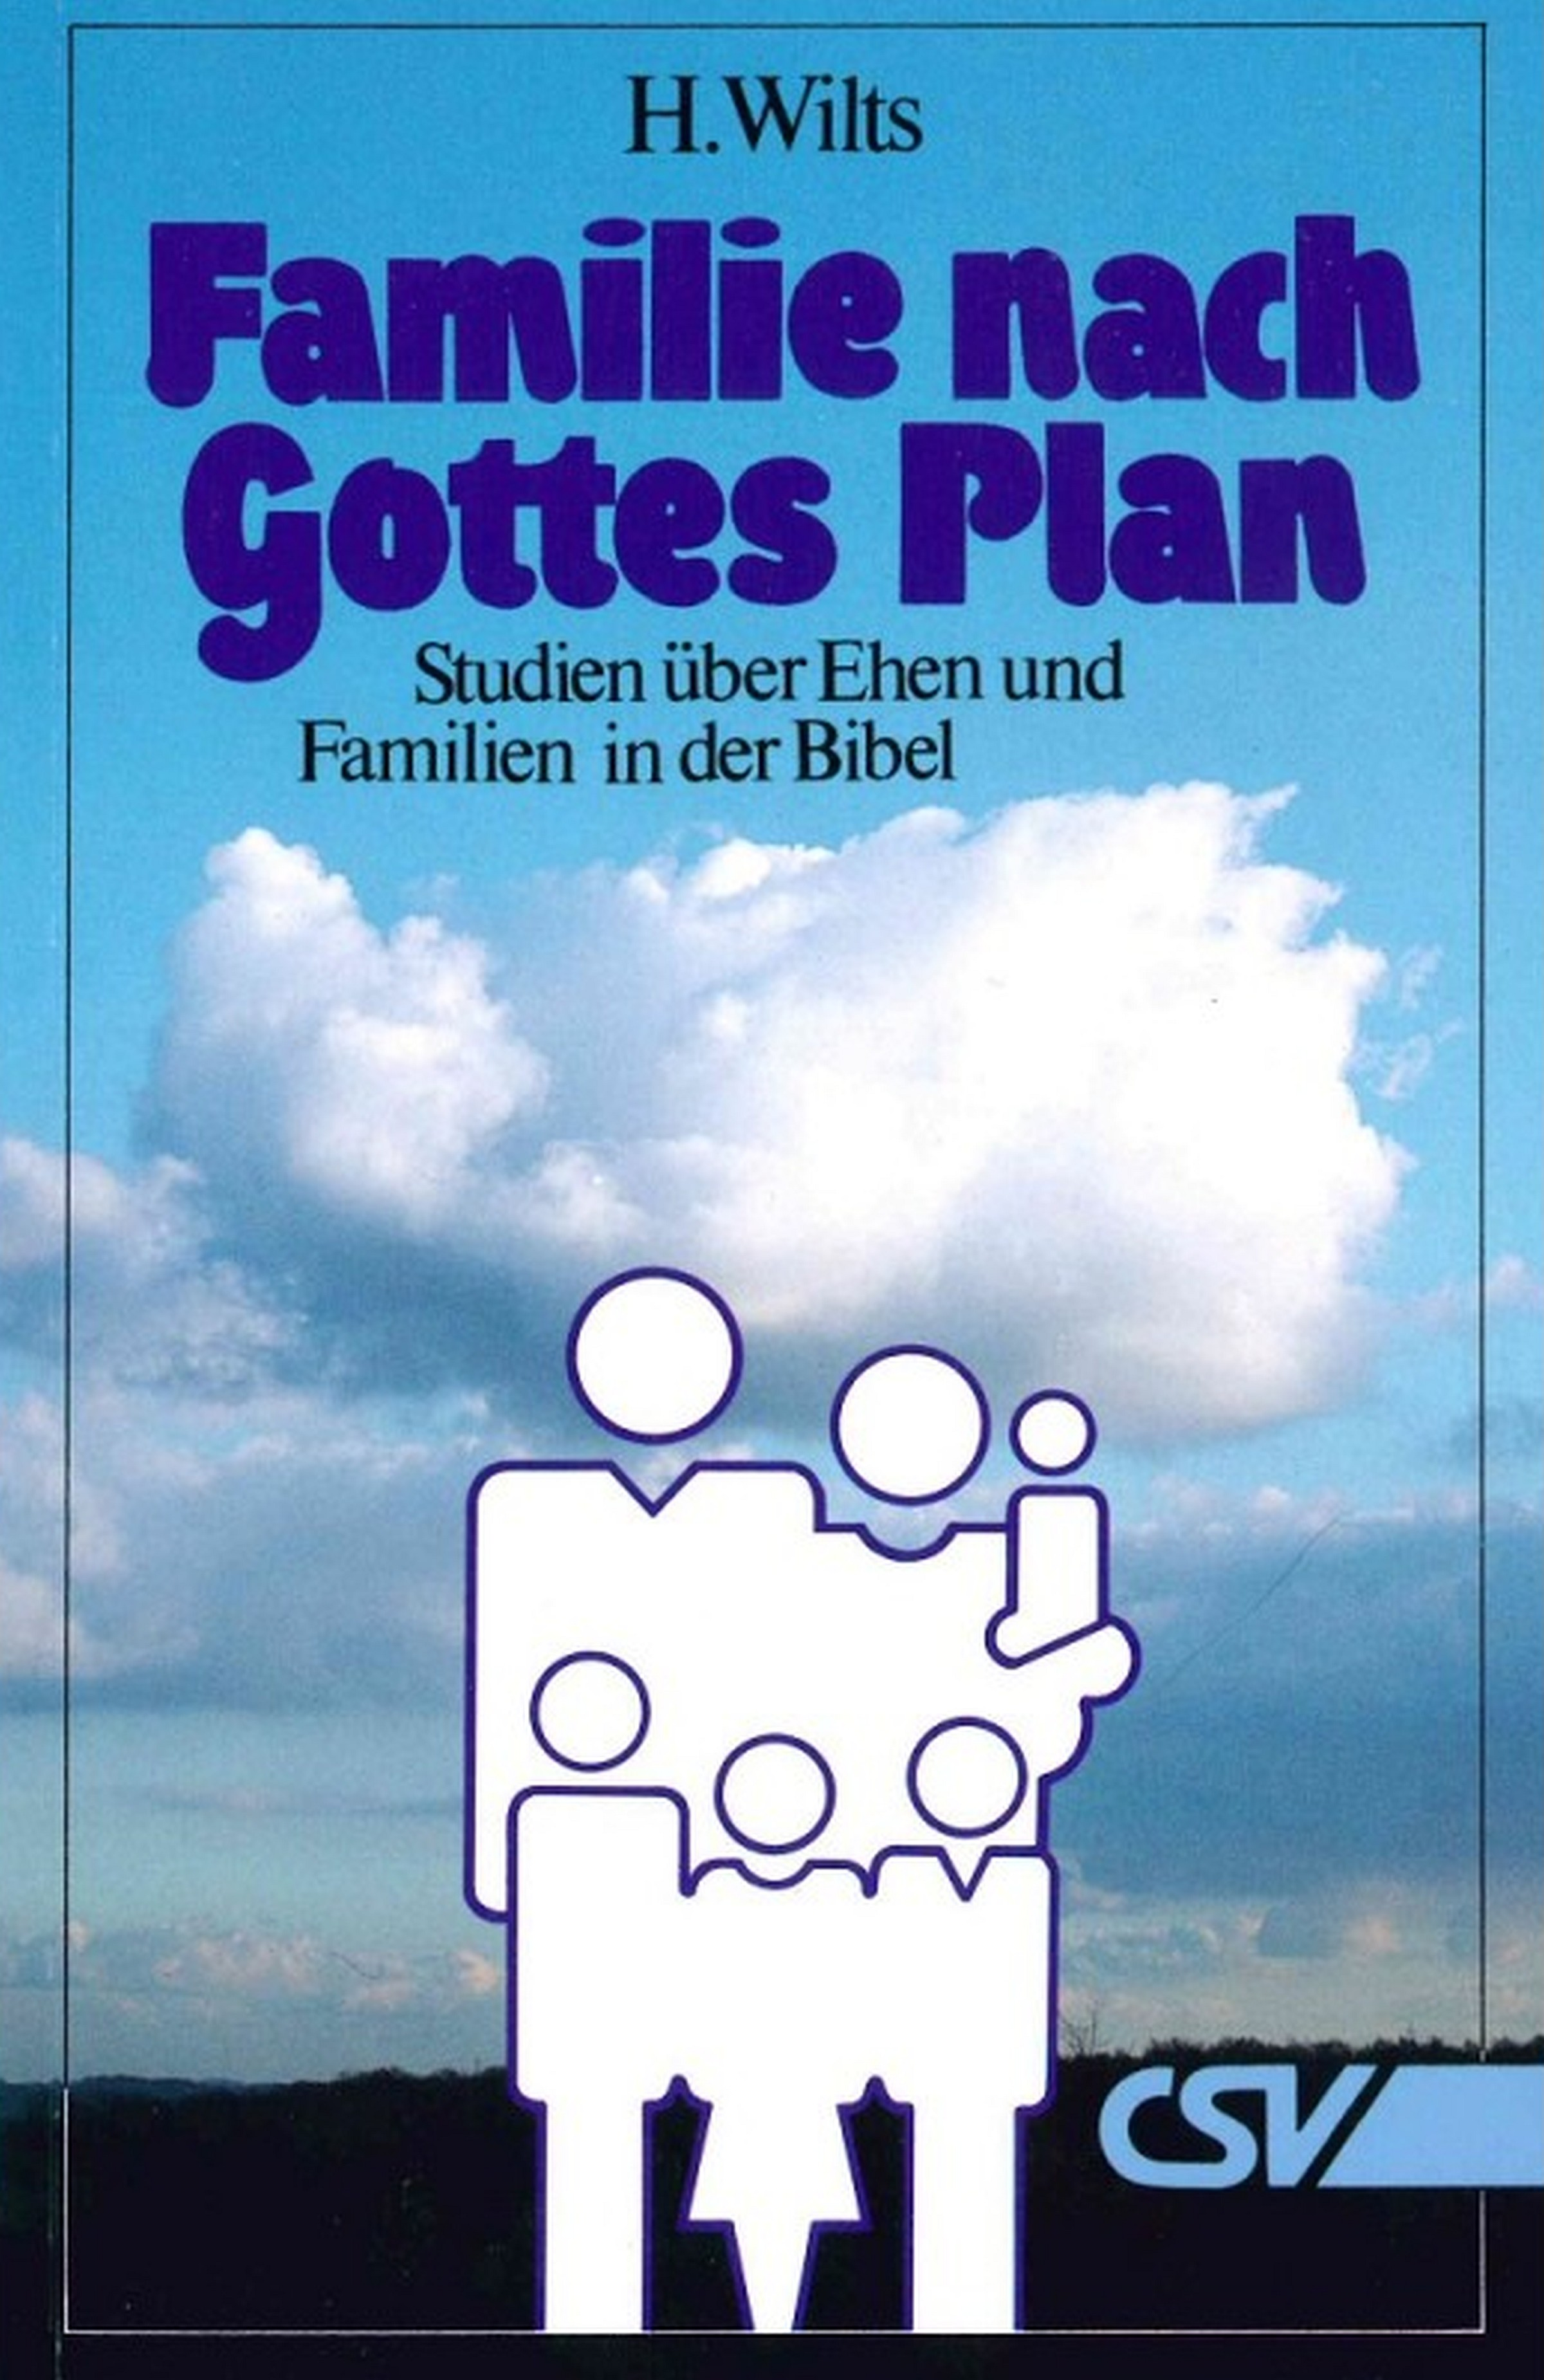 цены H. Wilts Famiie nach Gottes Plan